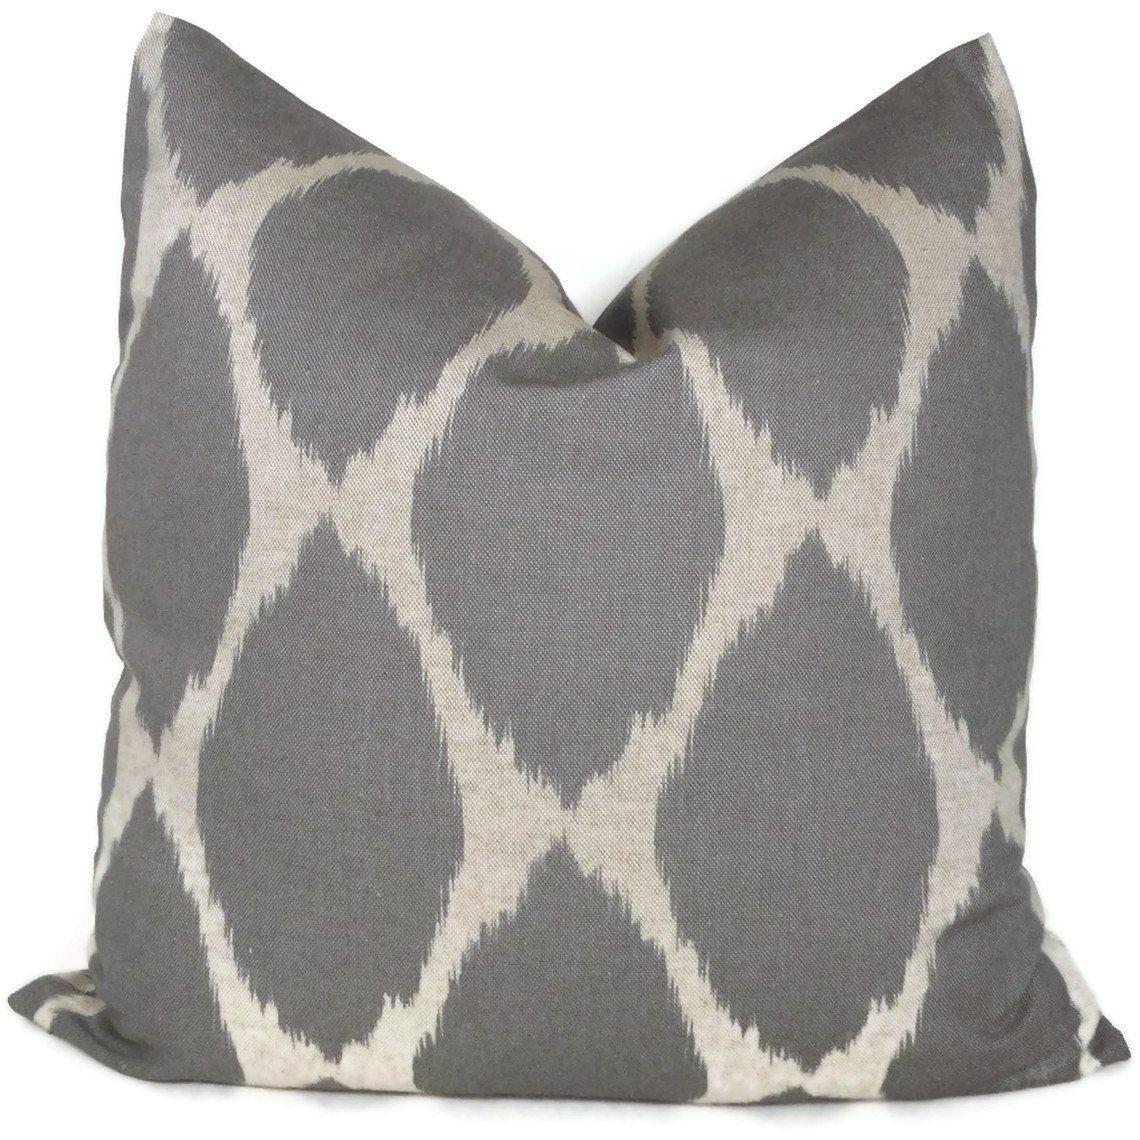 west elm gray ikat decorative pillow cover lumbar pillow accent pillow throw pillow toss. Black Bedroom Furniture Sets. Home Design Ideas